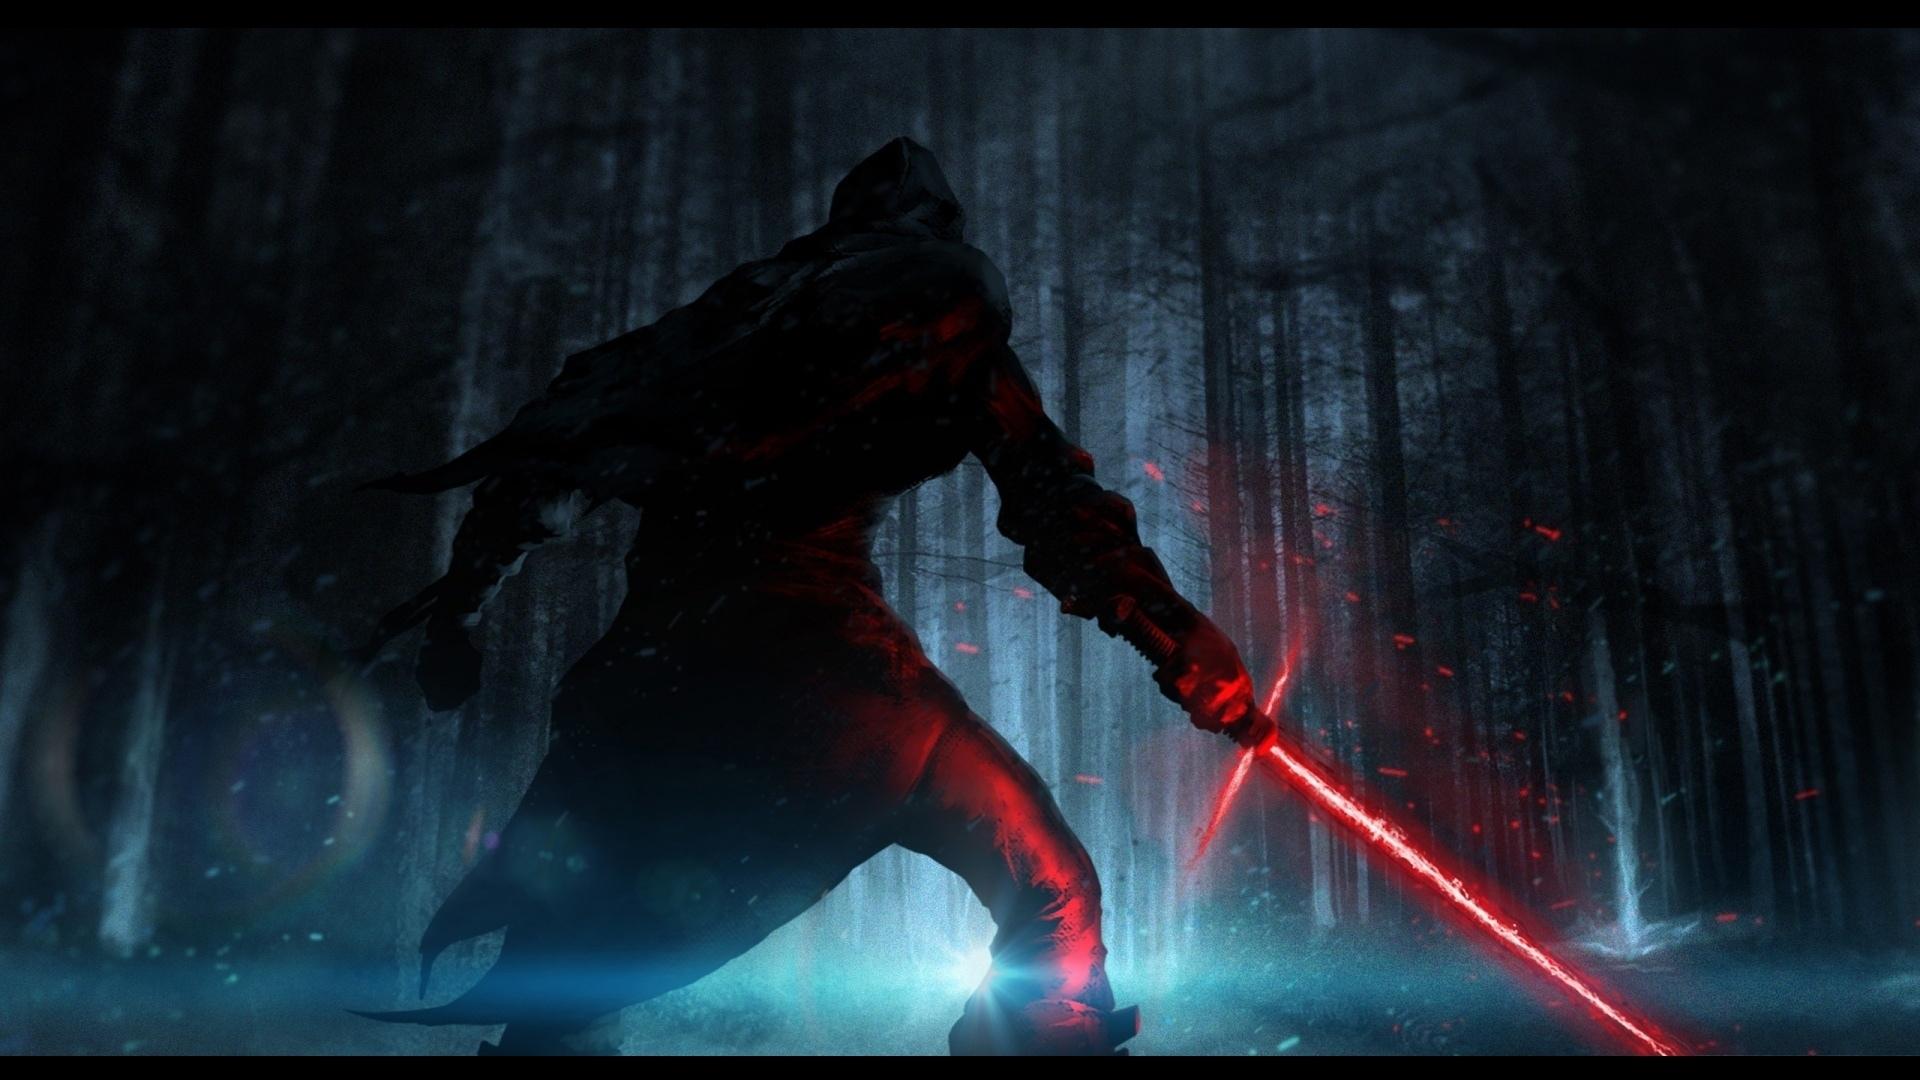 10 Best Star Wars Wallpaper Kylo Ren FULL HD 1080p For PC Background